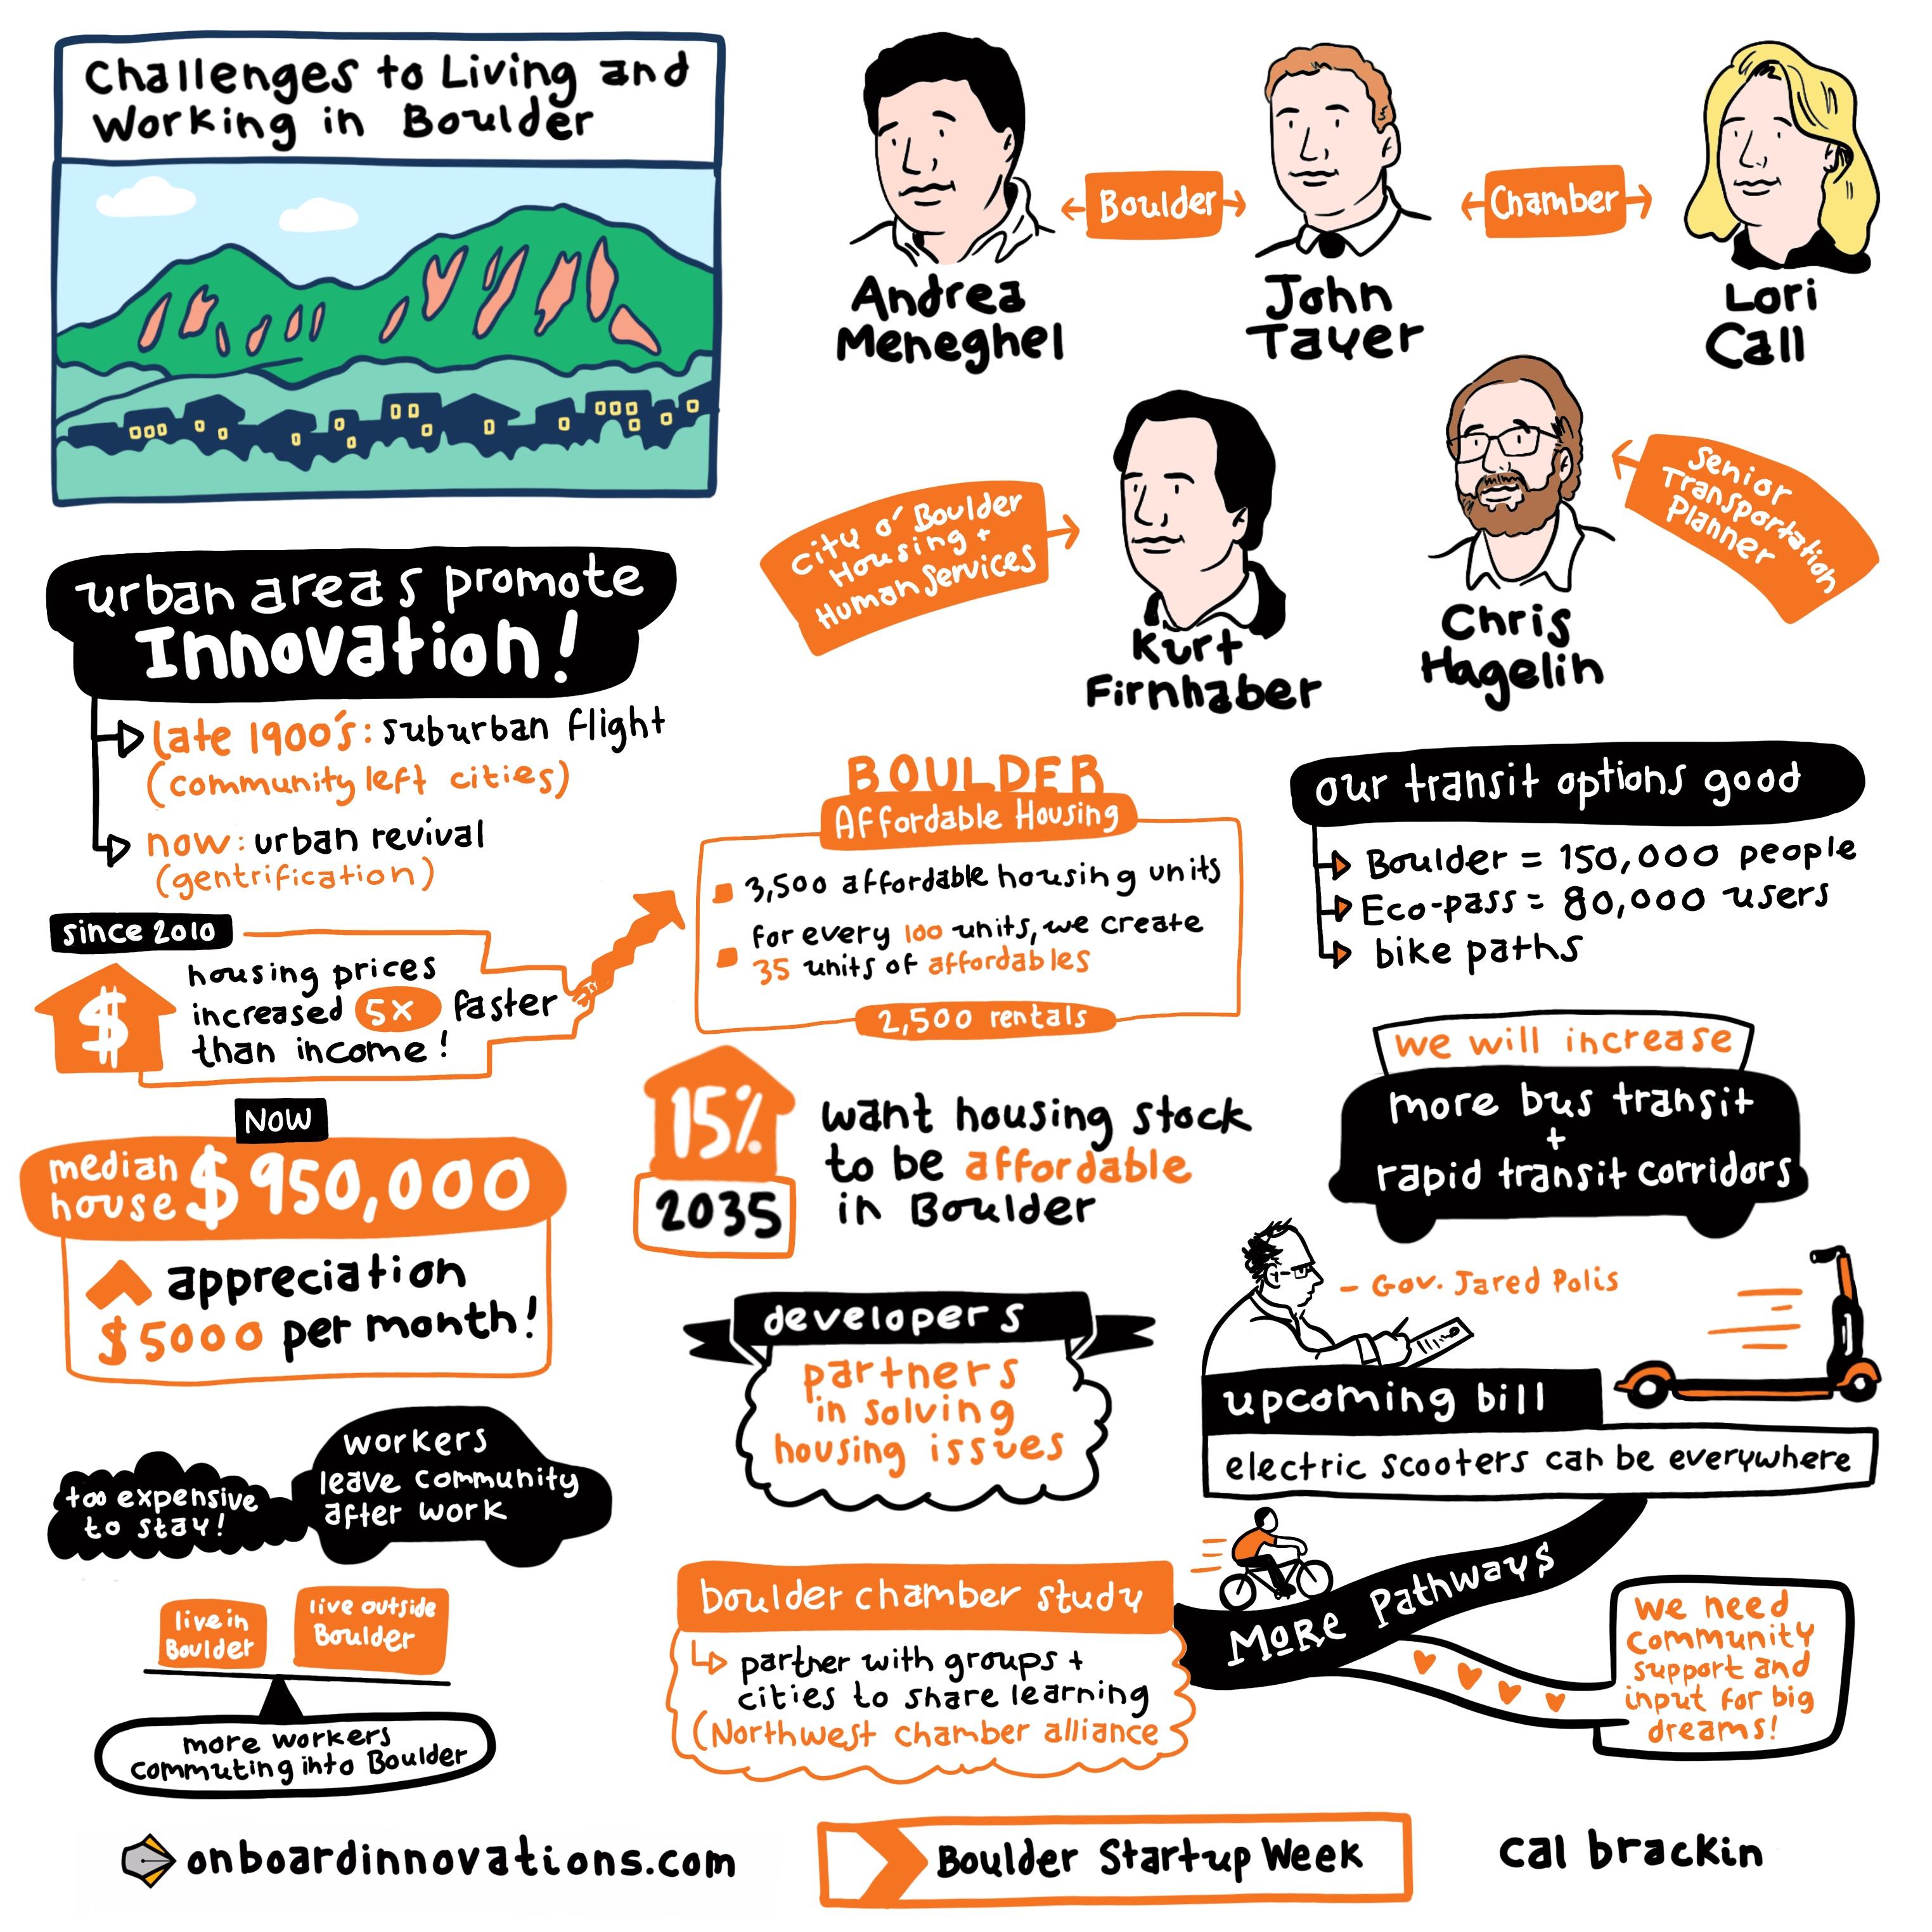 Illustration courtesy of On Board Innovations